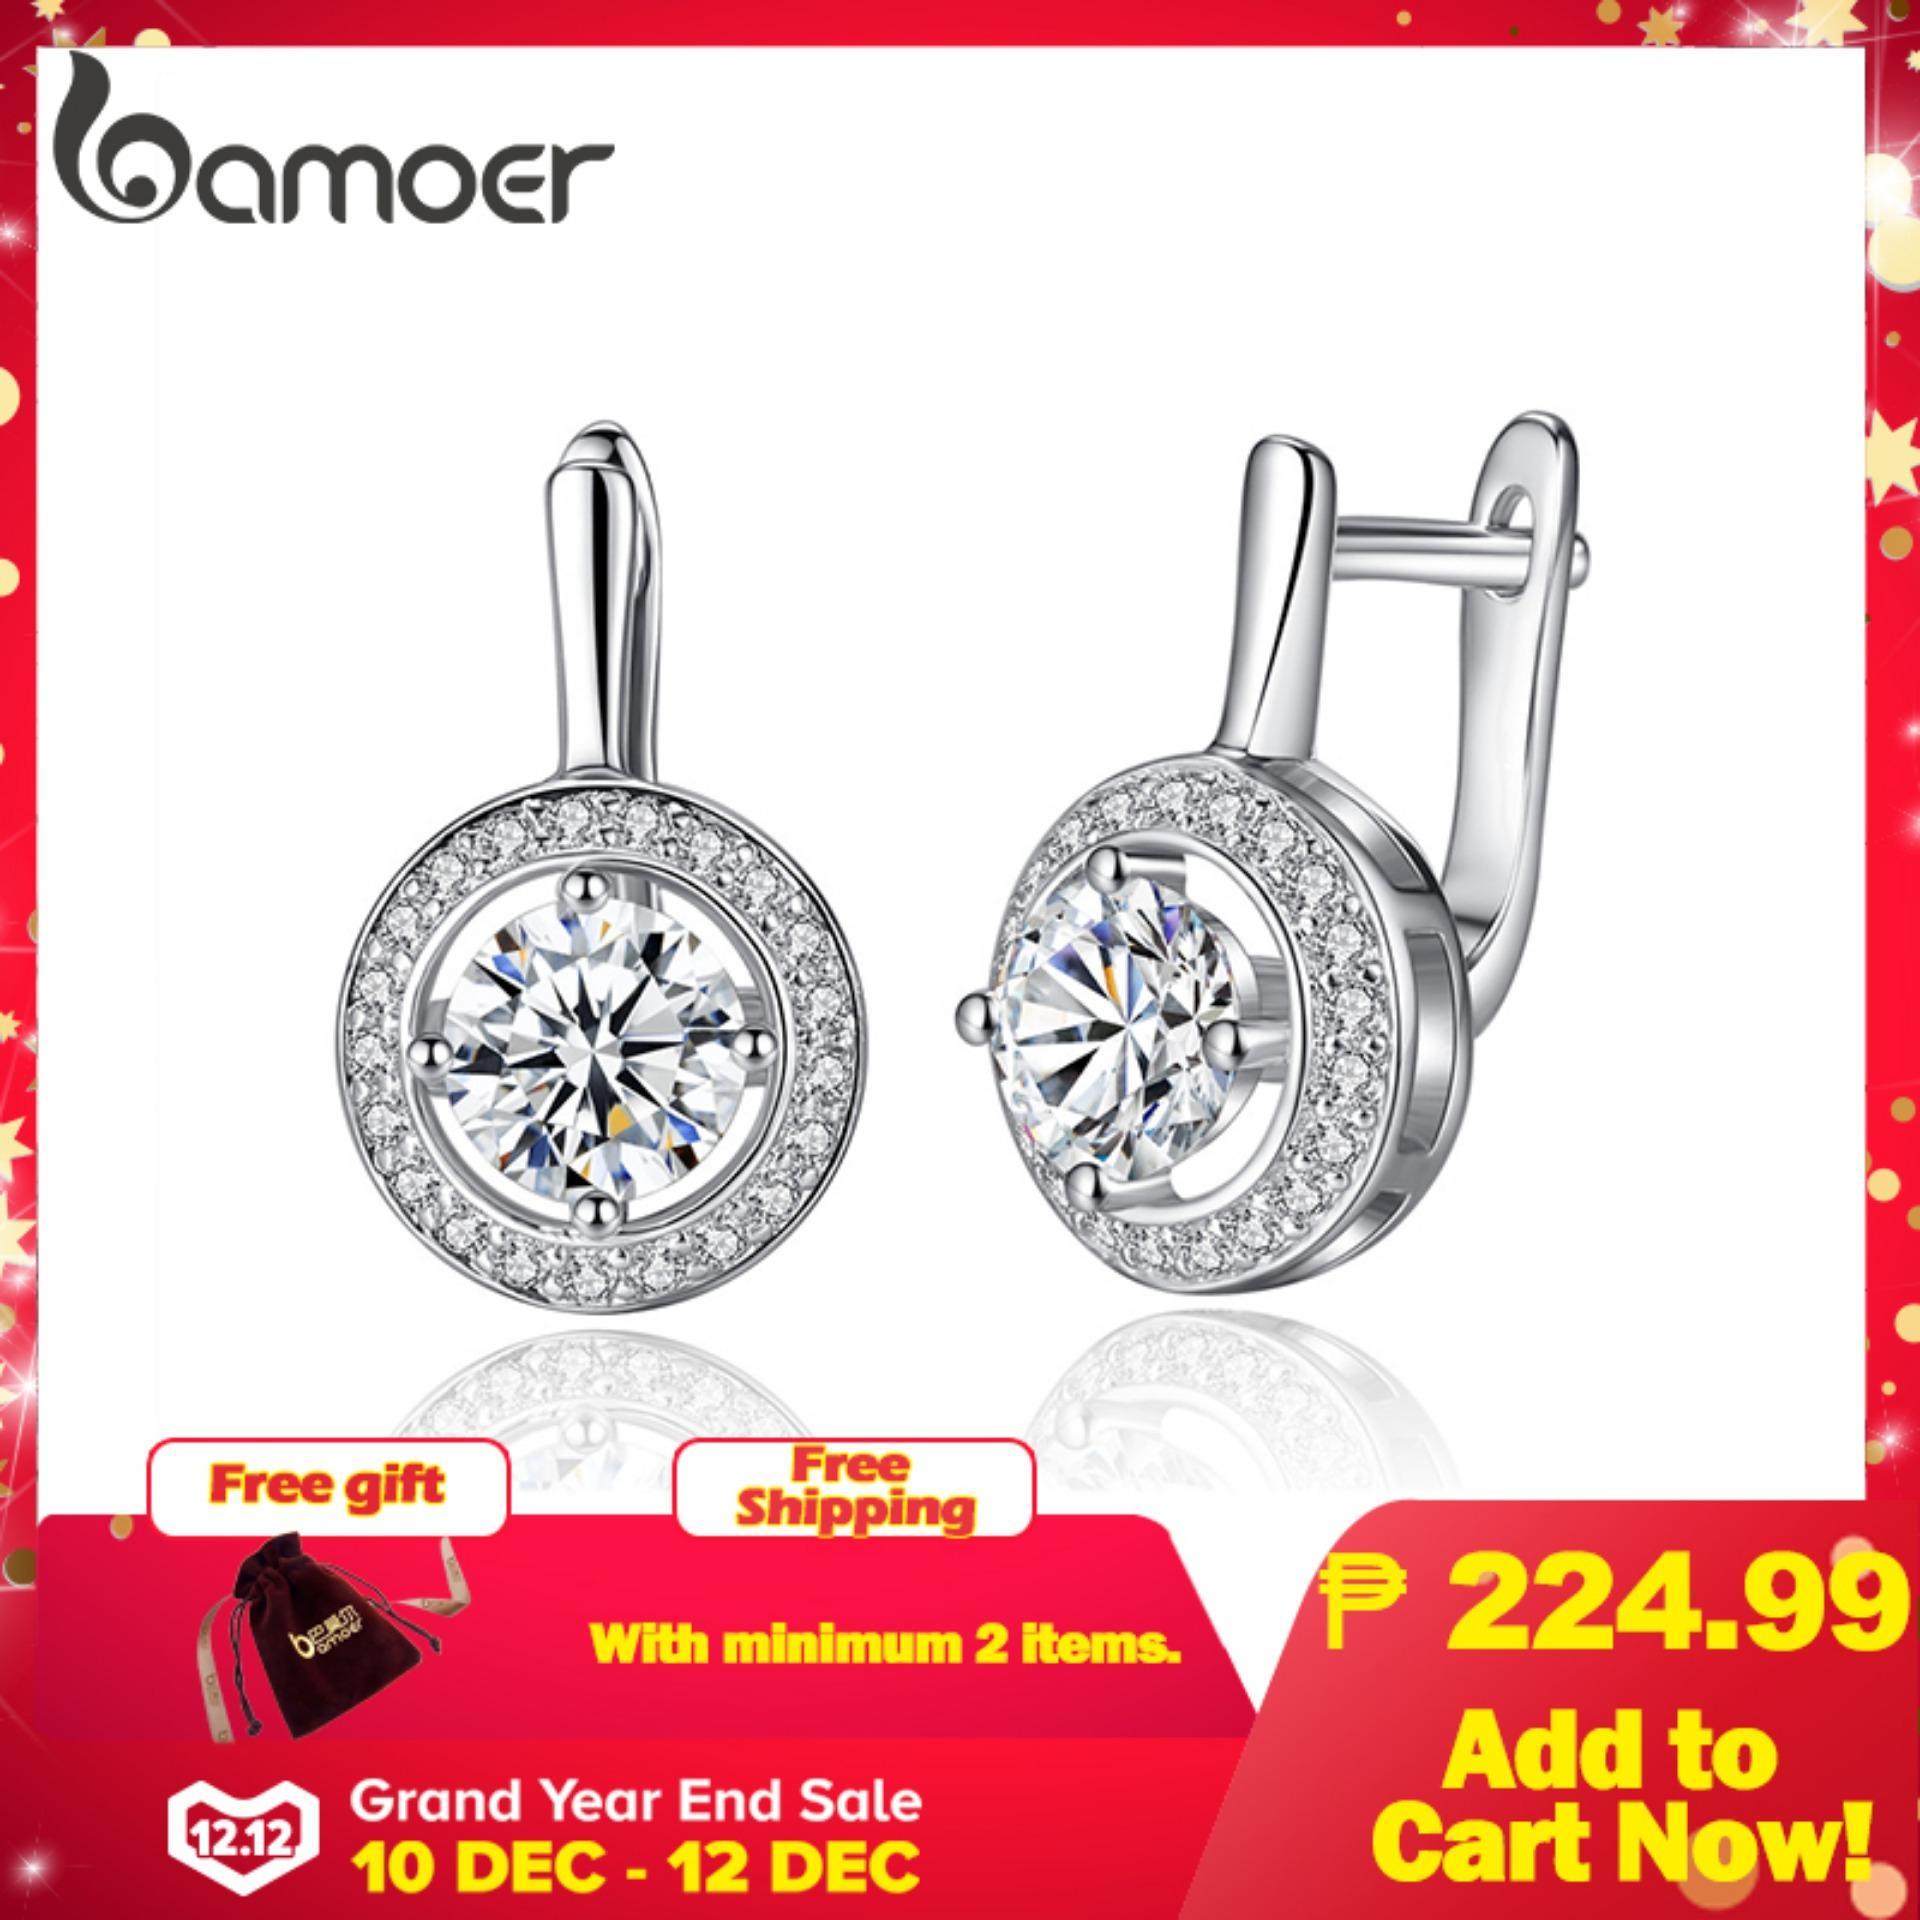 BAMOER Free Shpping New Arrival Silver Color Round Shape Full Of Love Dangle Earrings For Women